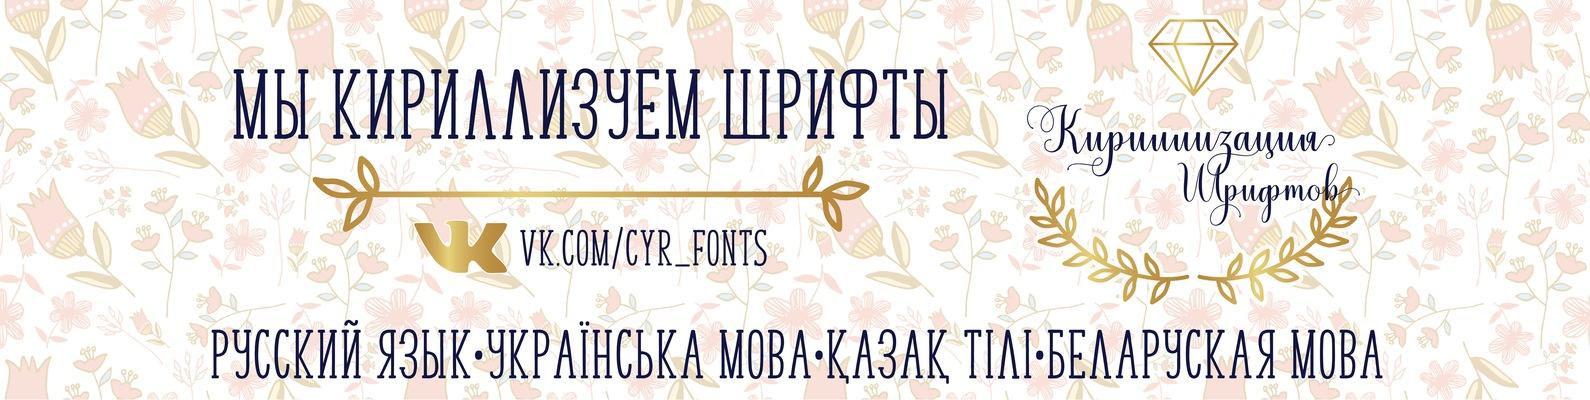 кириллизация шрифтов вконтакте